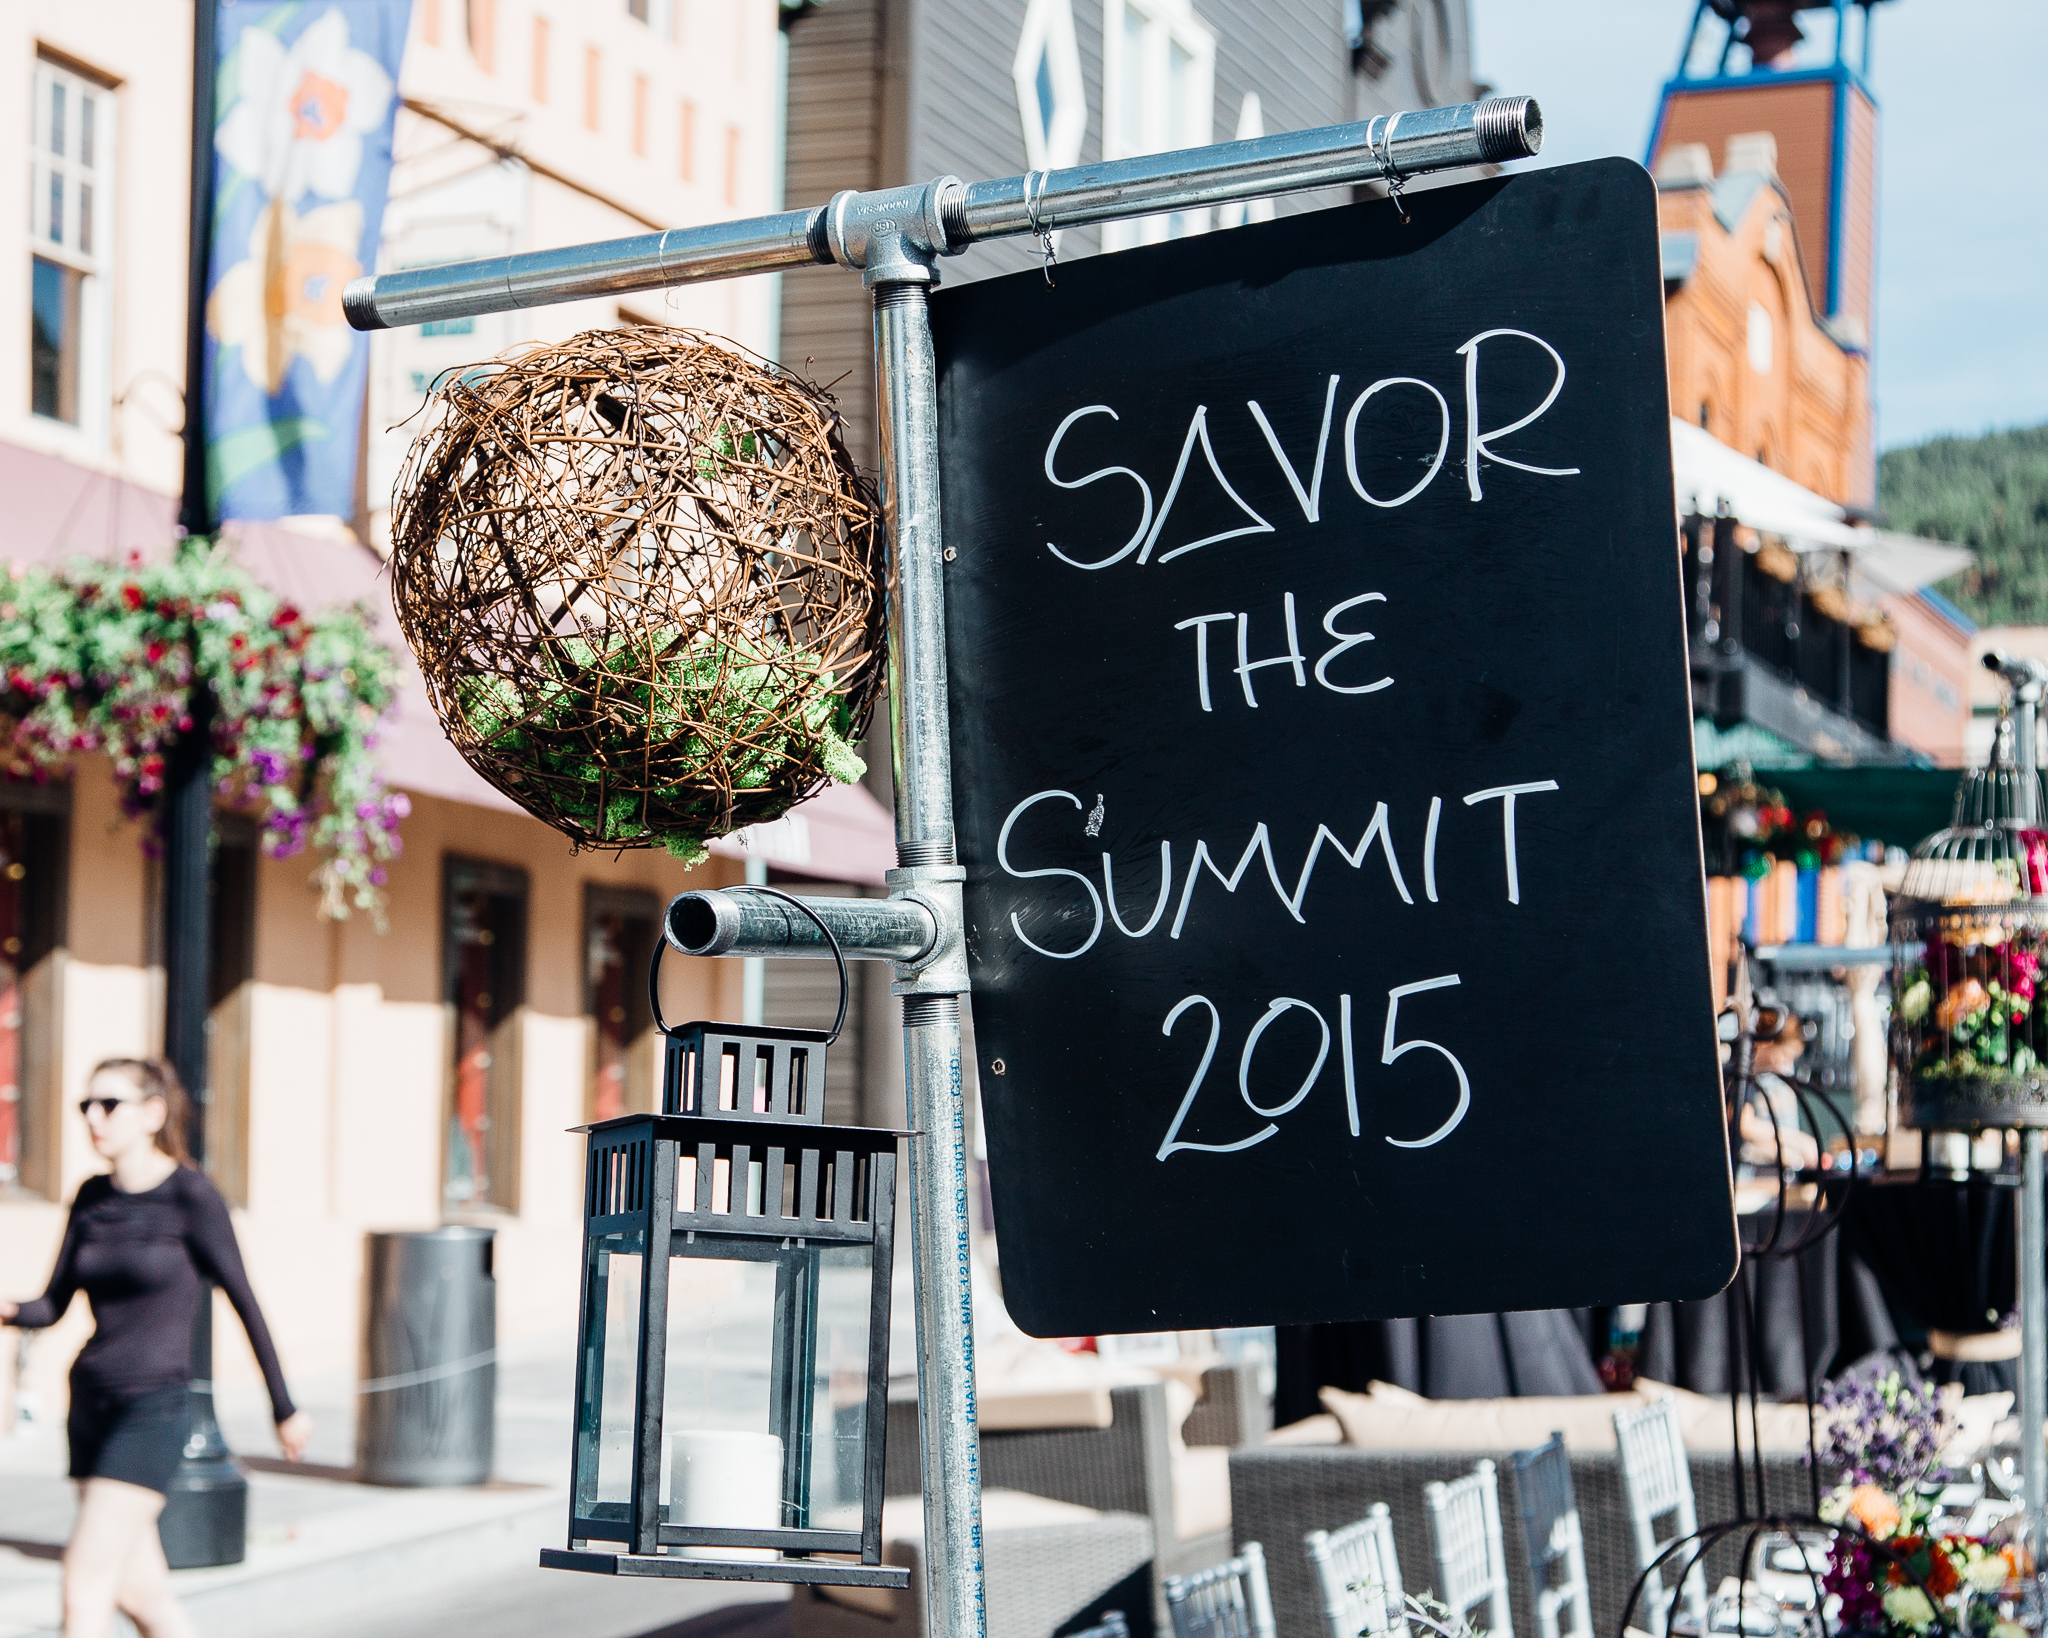 Savor the Summit 2015